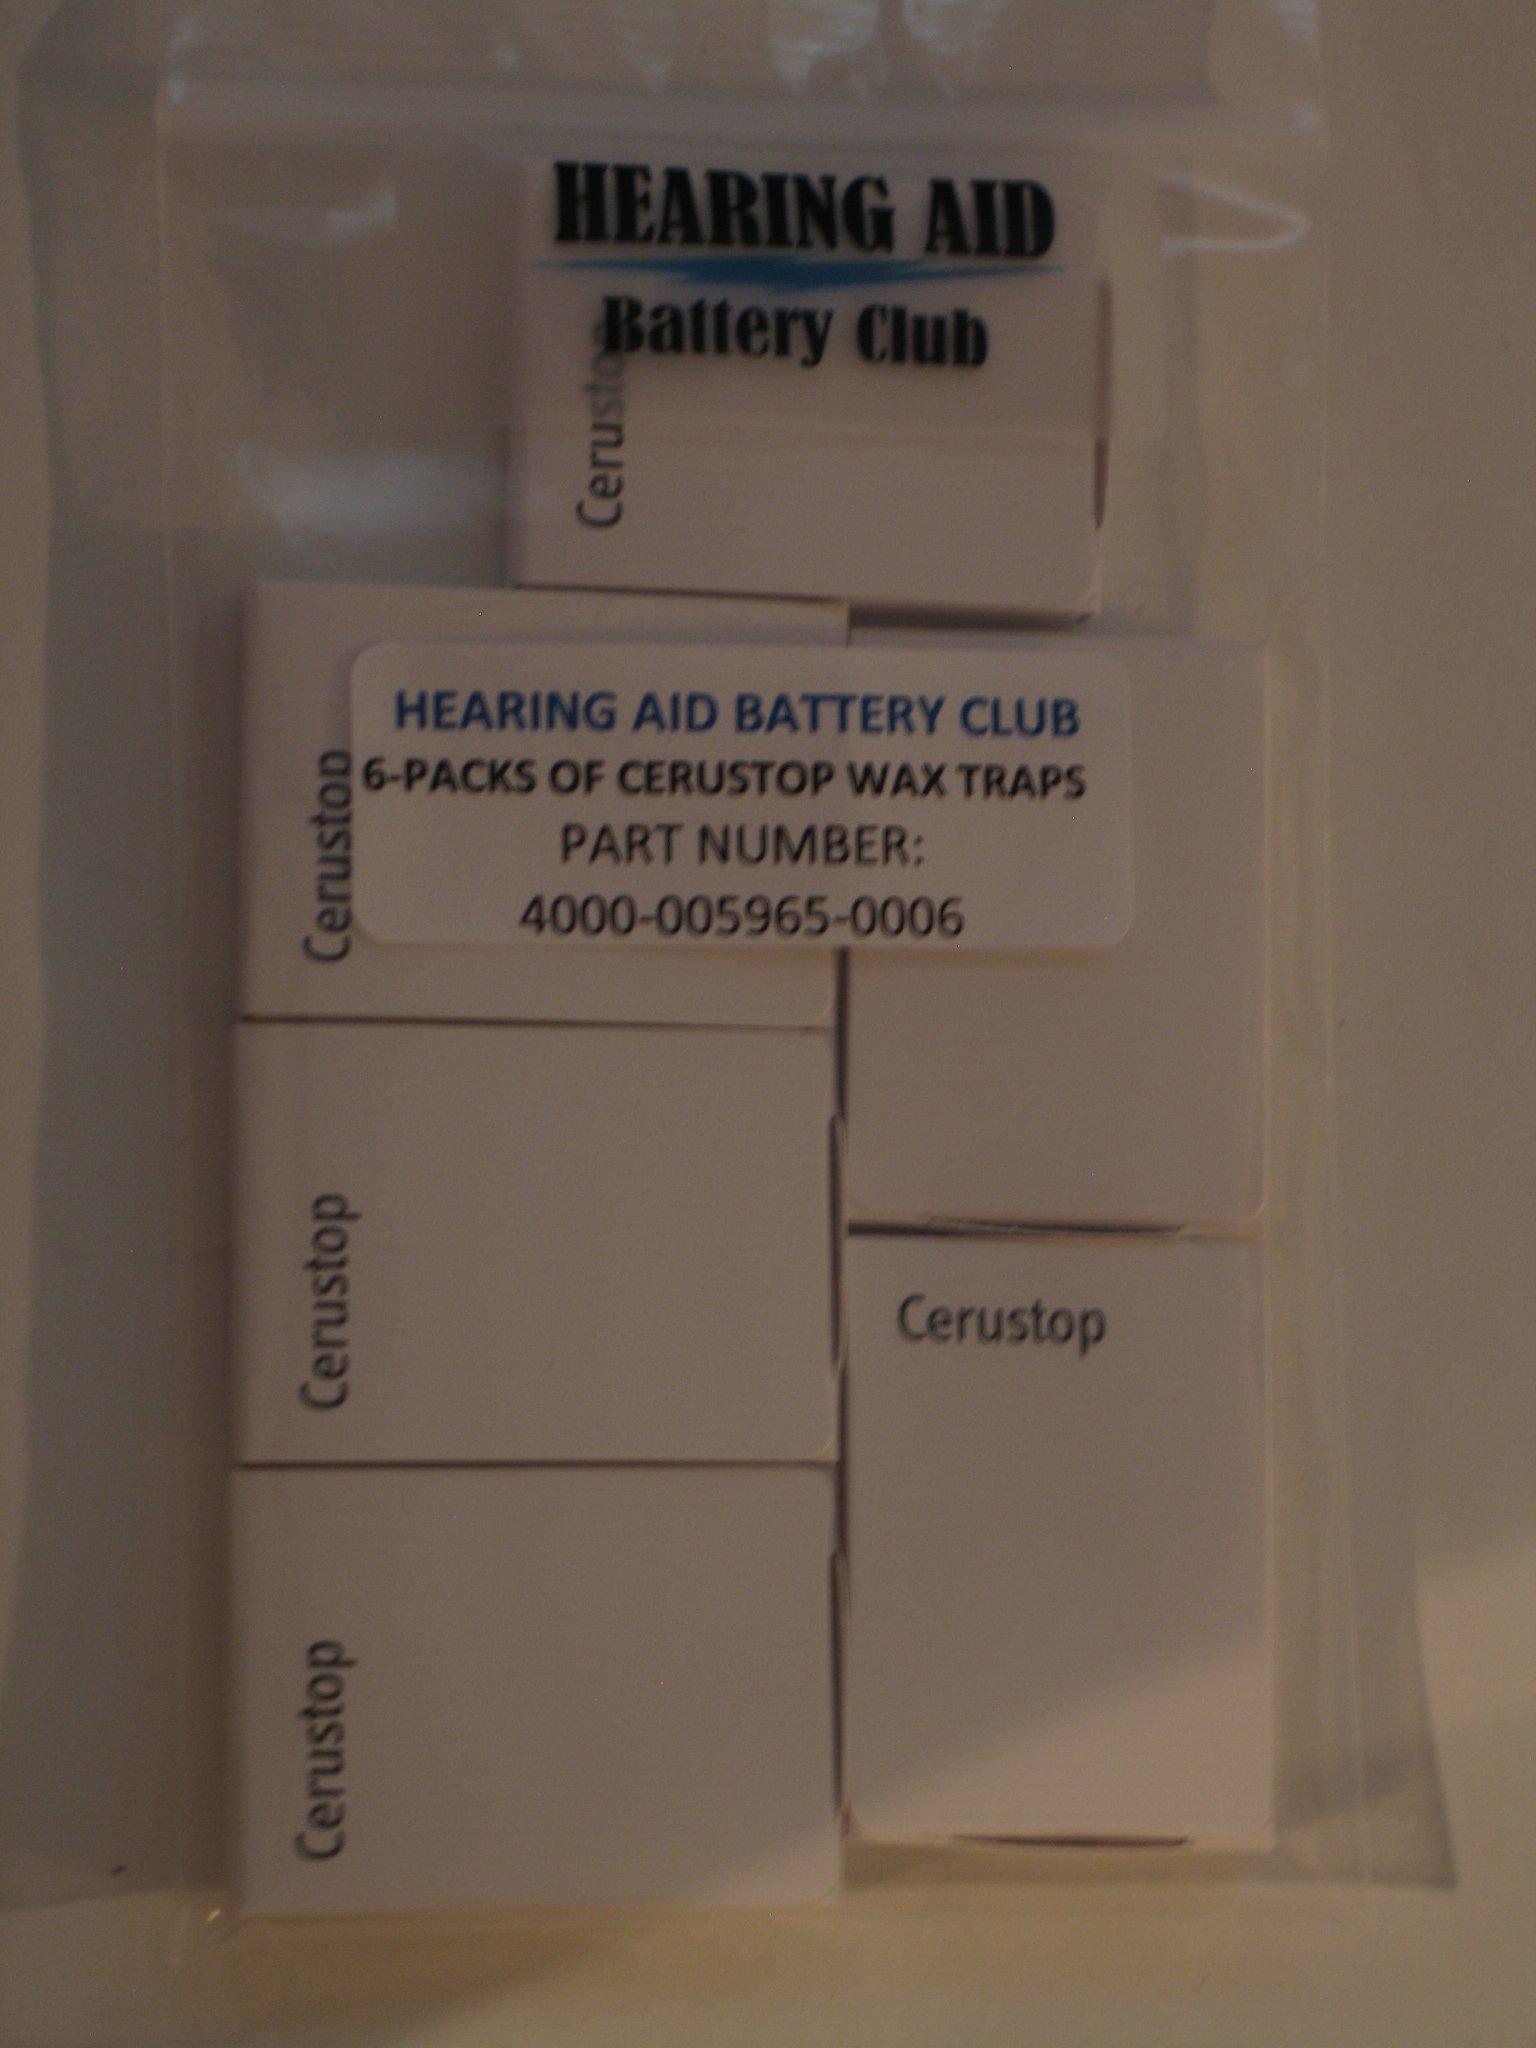 (6 Packs) Genuine Cerustop by Hearing Aid Battery Club